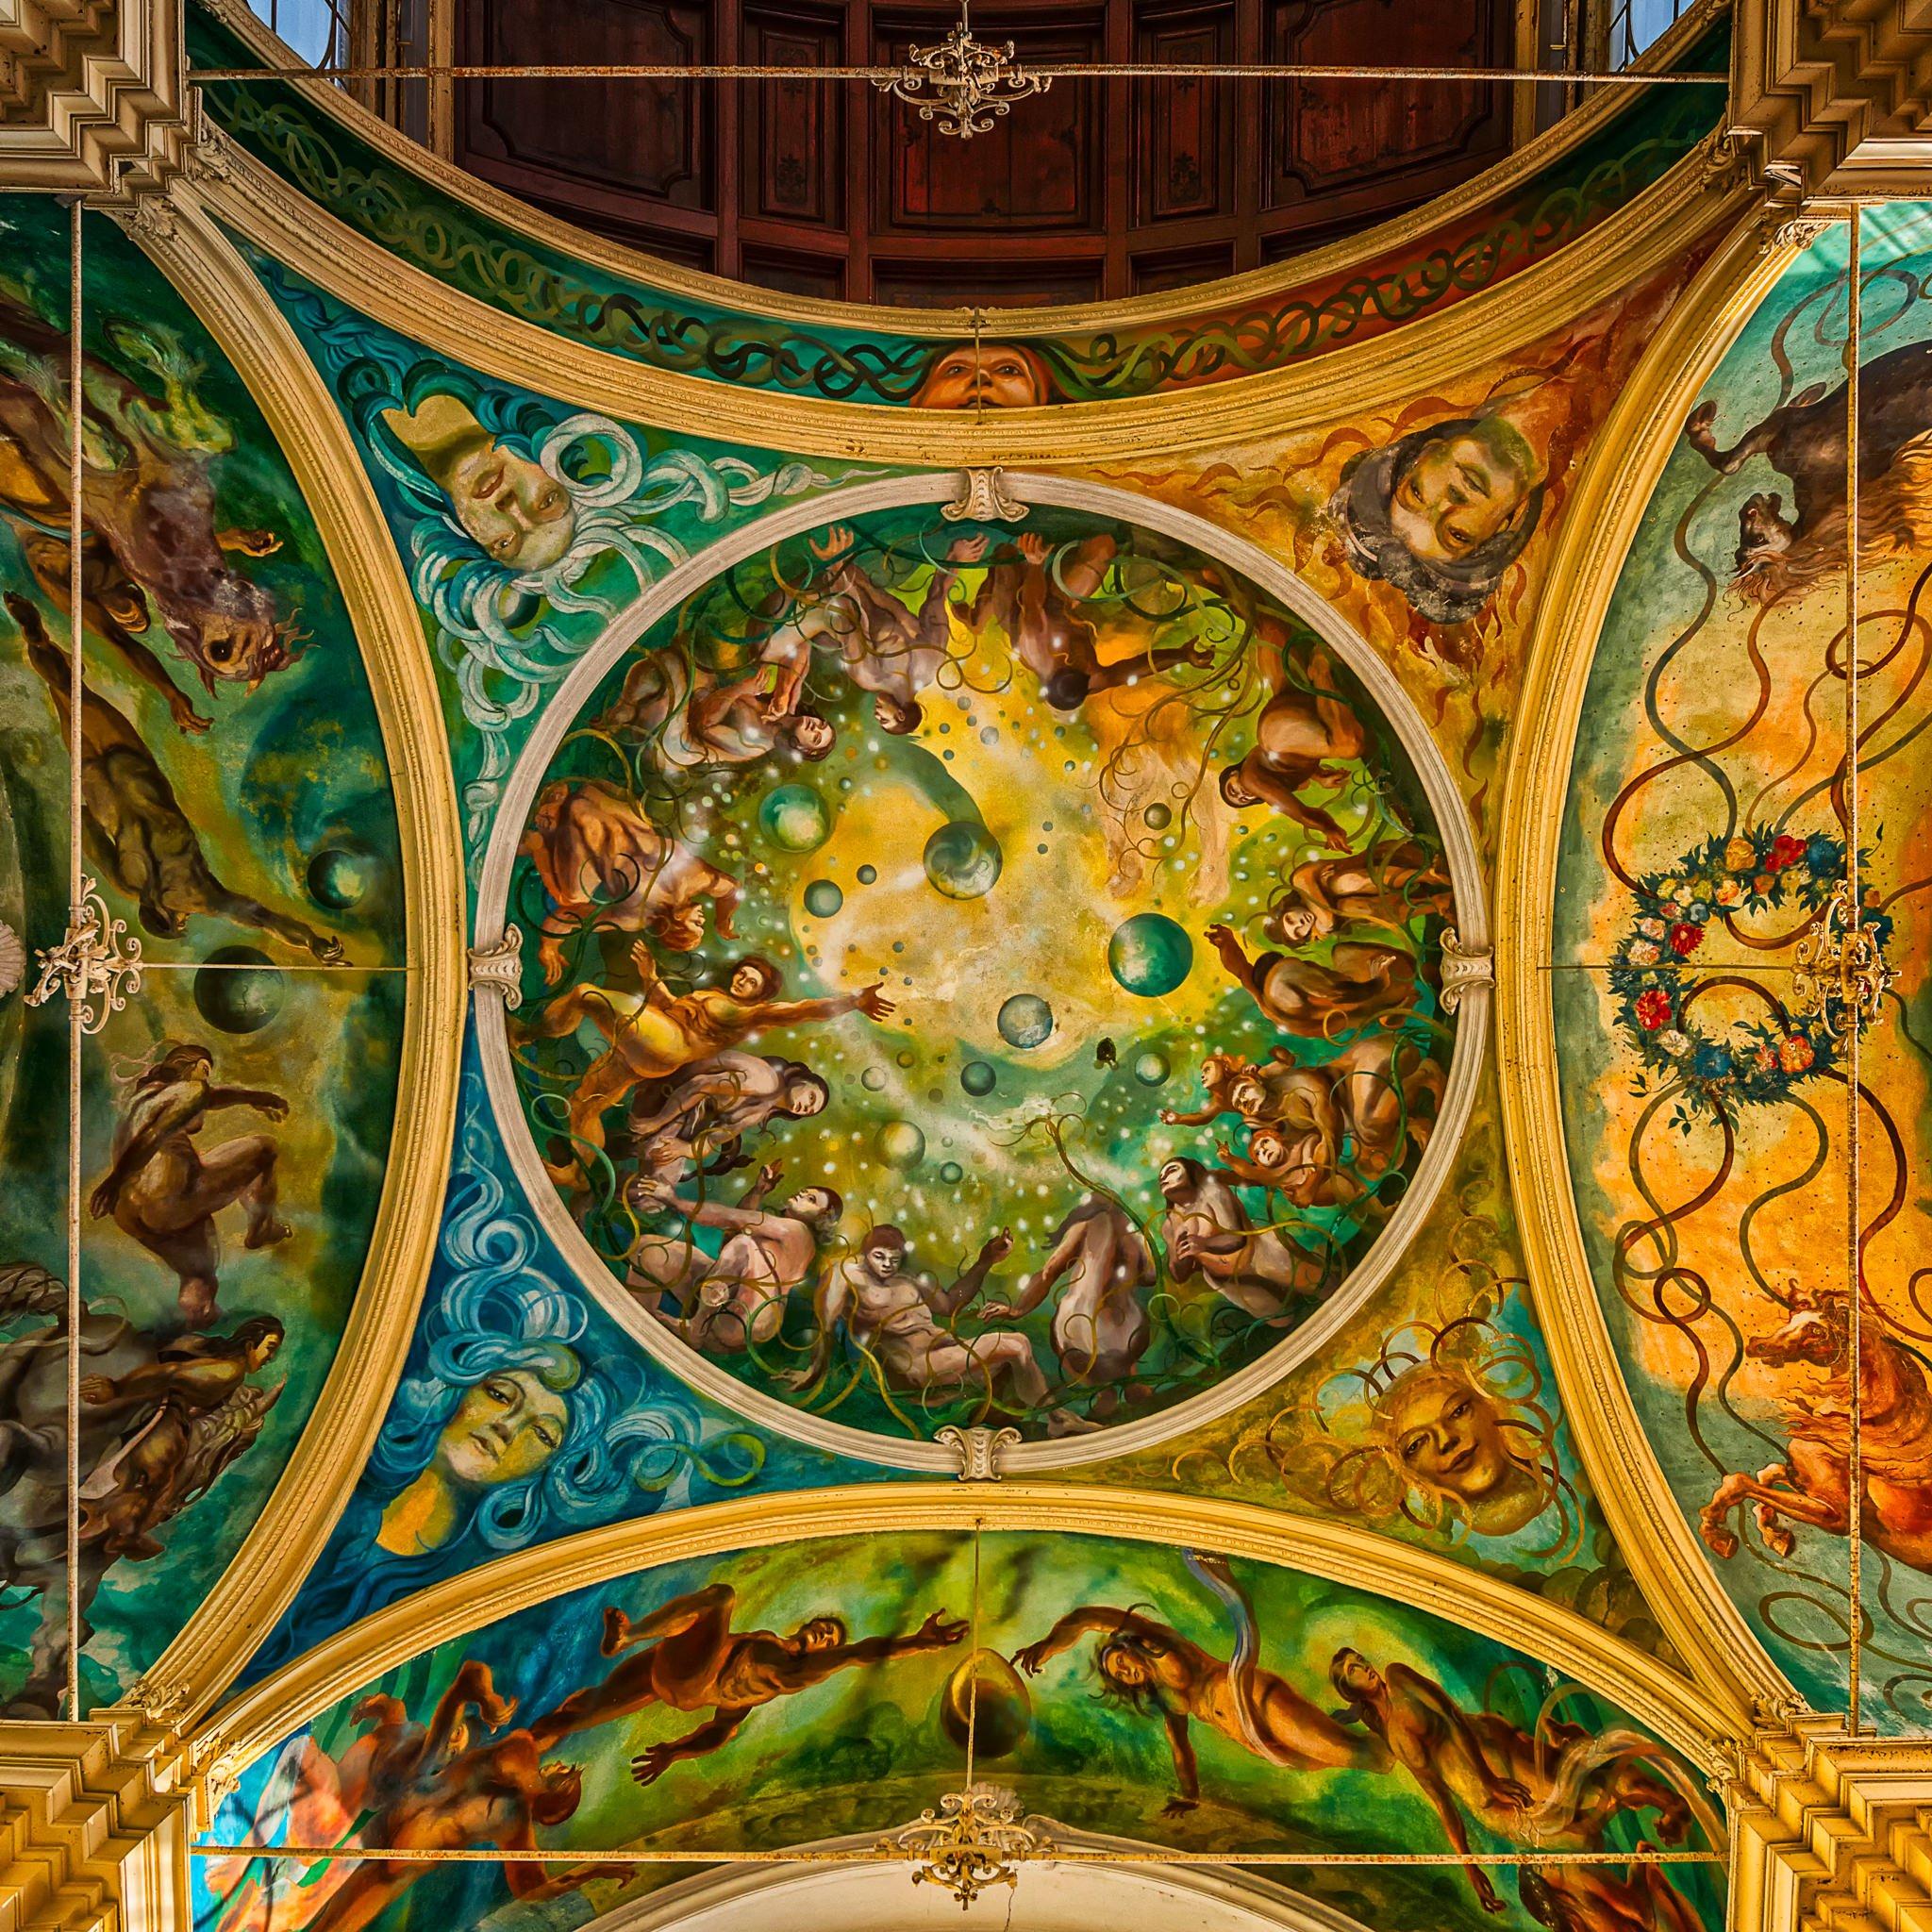 Mariánské Lázně (Marienbad)-Fresken in der Maxim-Gorki-Kolonnade.